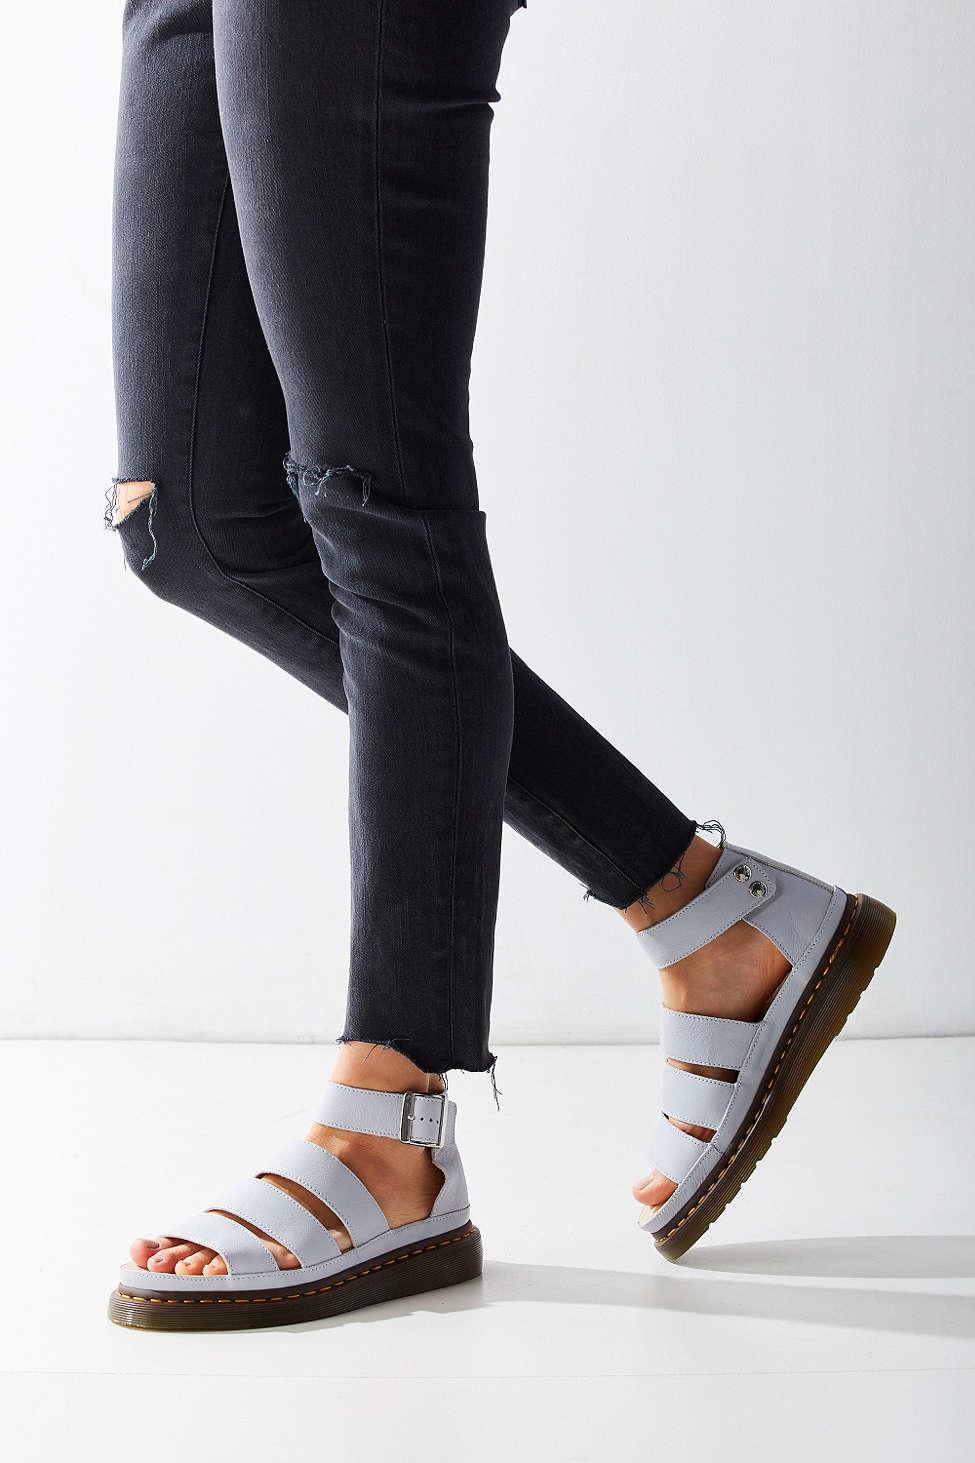 K Shoes Clarks